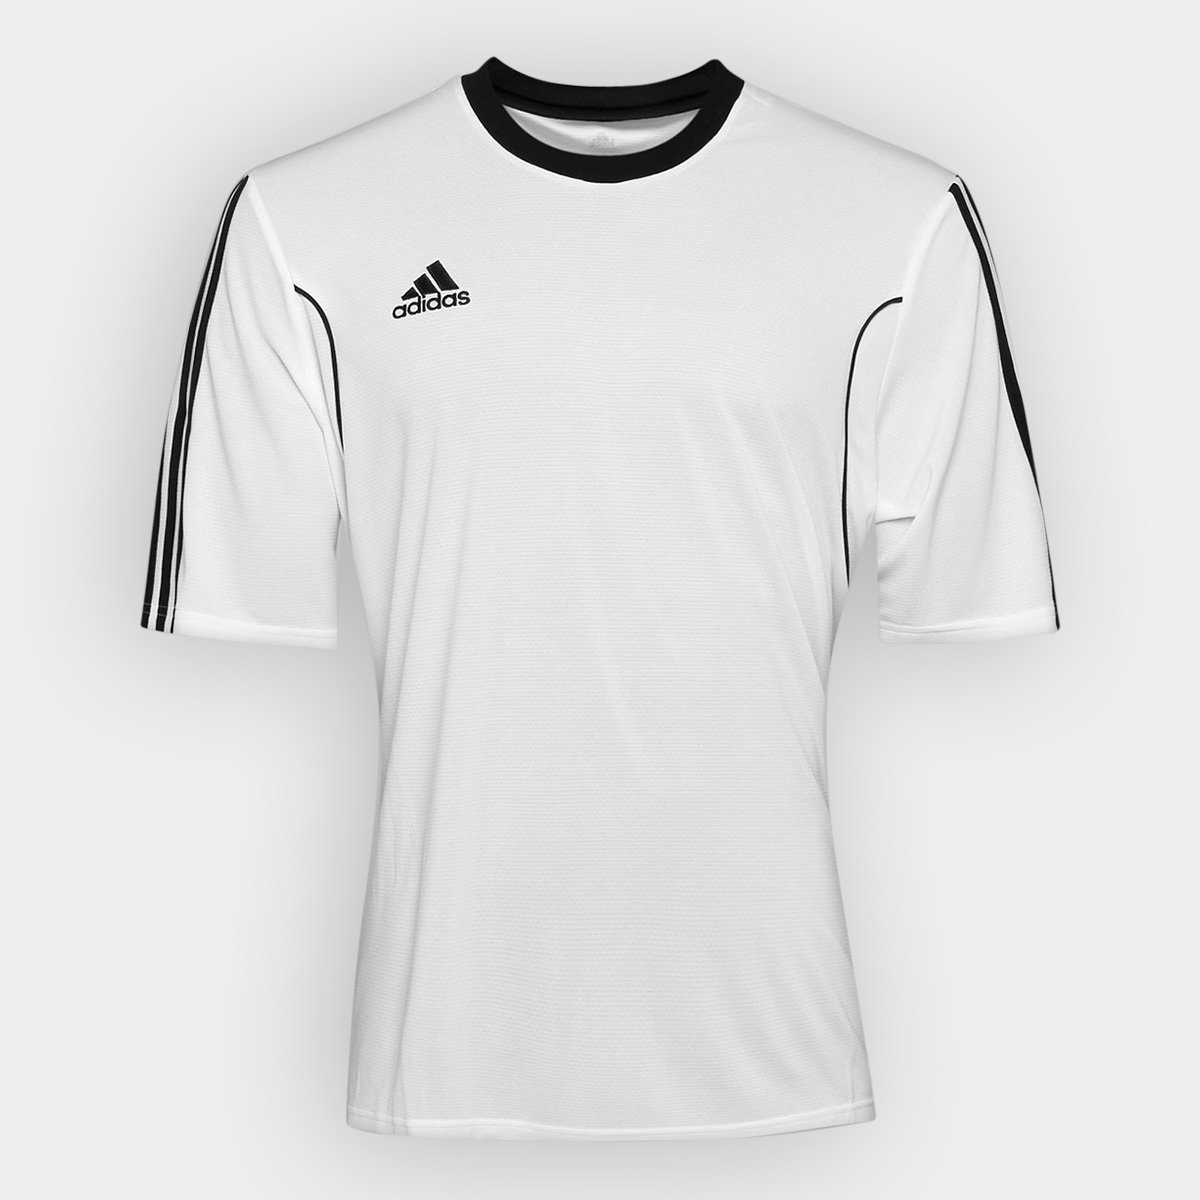 Camisa Adidas Squadra 13 Masculina - Compre Agora  f7fade0f01446